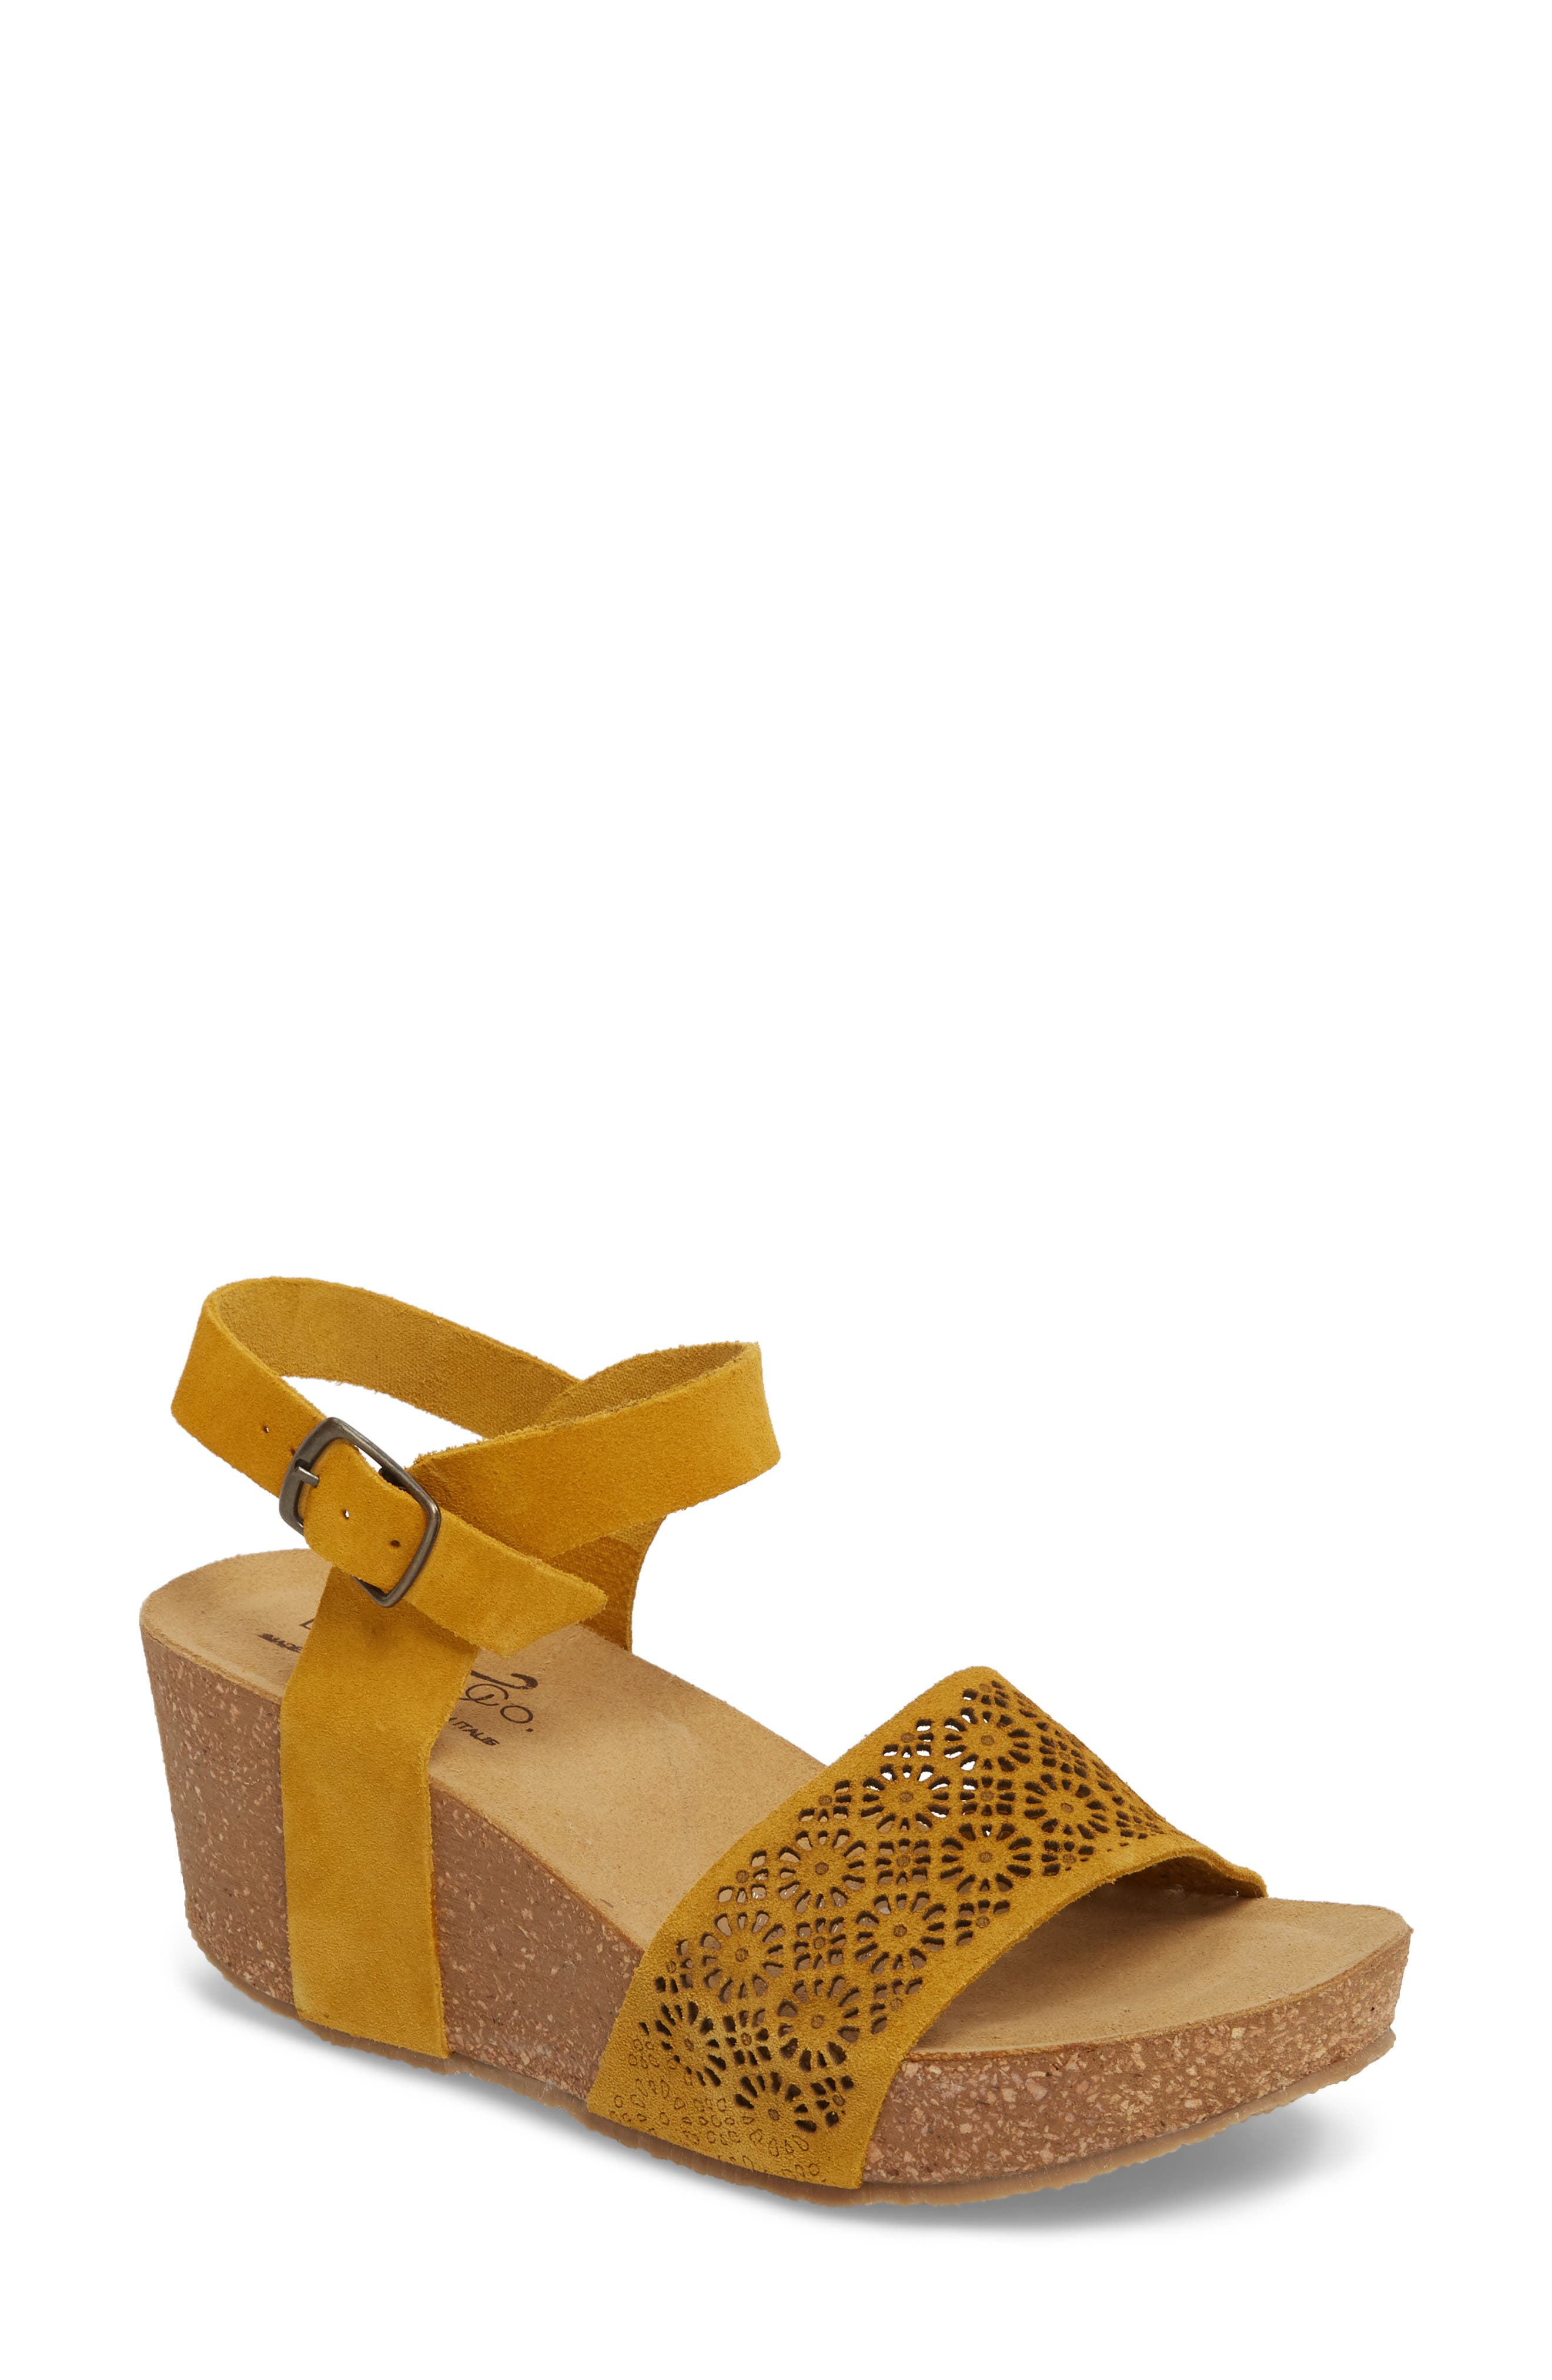 Bos. & Co. Lolo Platform Wedge Sandal (Women)